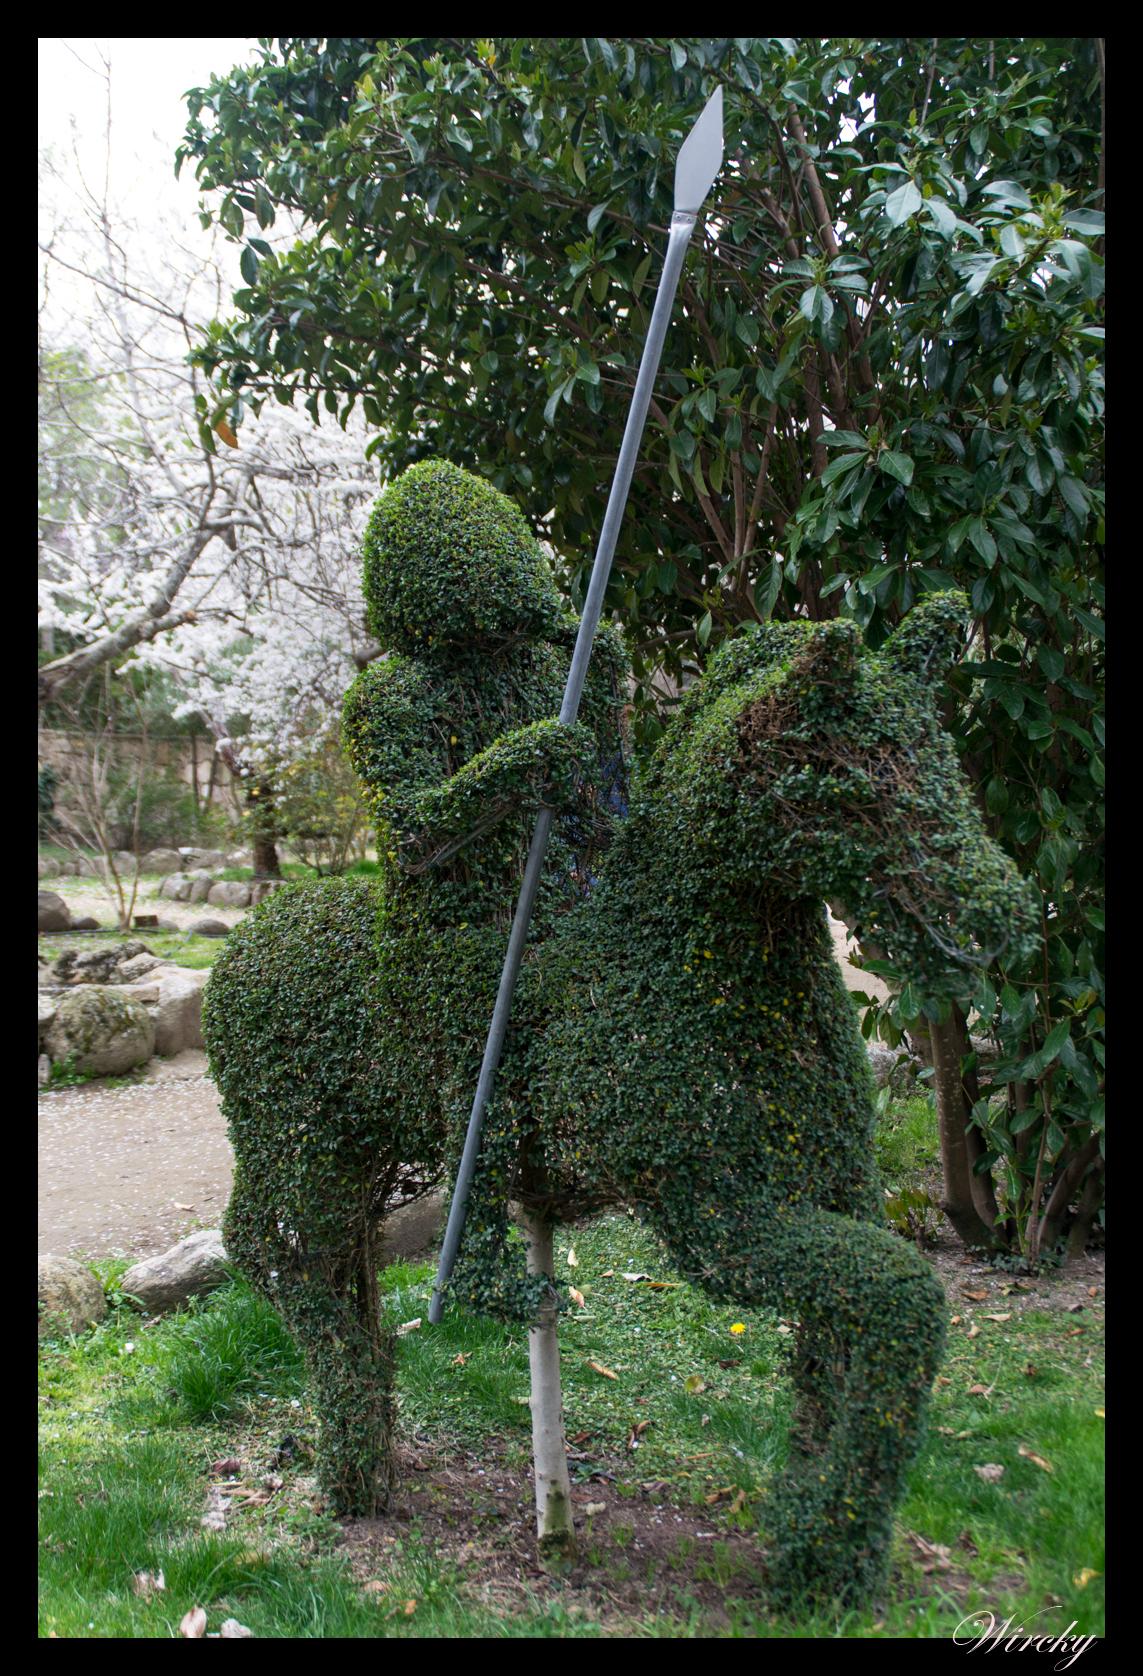 Jardin encantado madrid jardin encantado madrid osos el bosque encantado el bosque encantado - Jardin encantado madrid ...